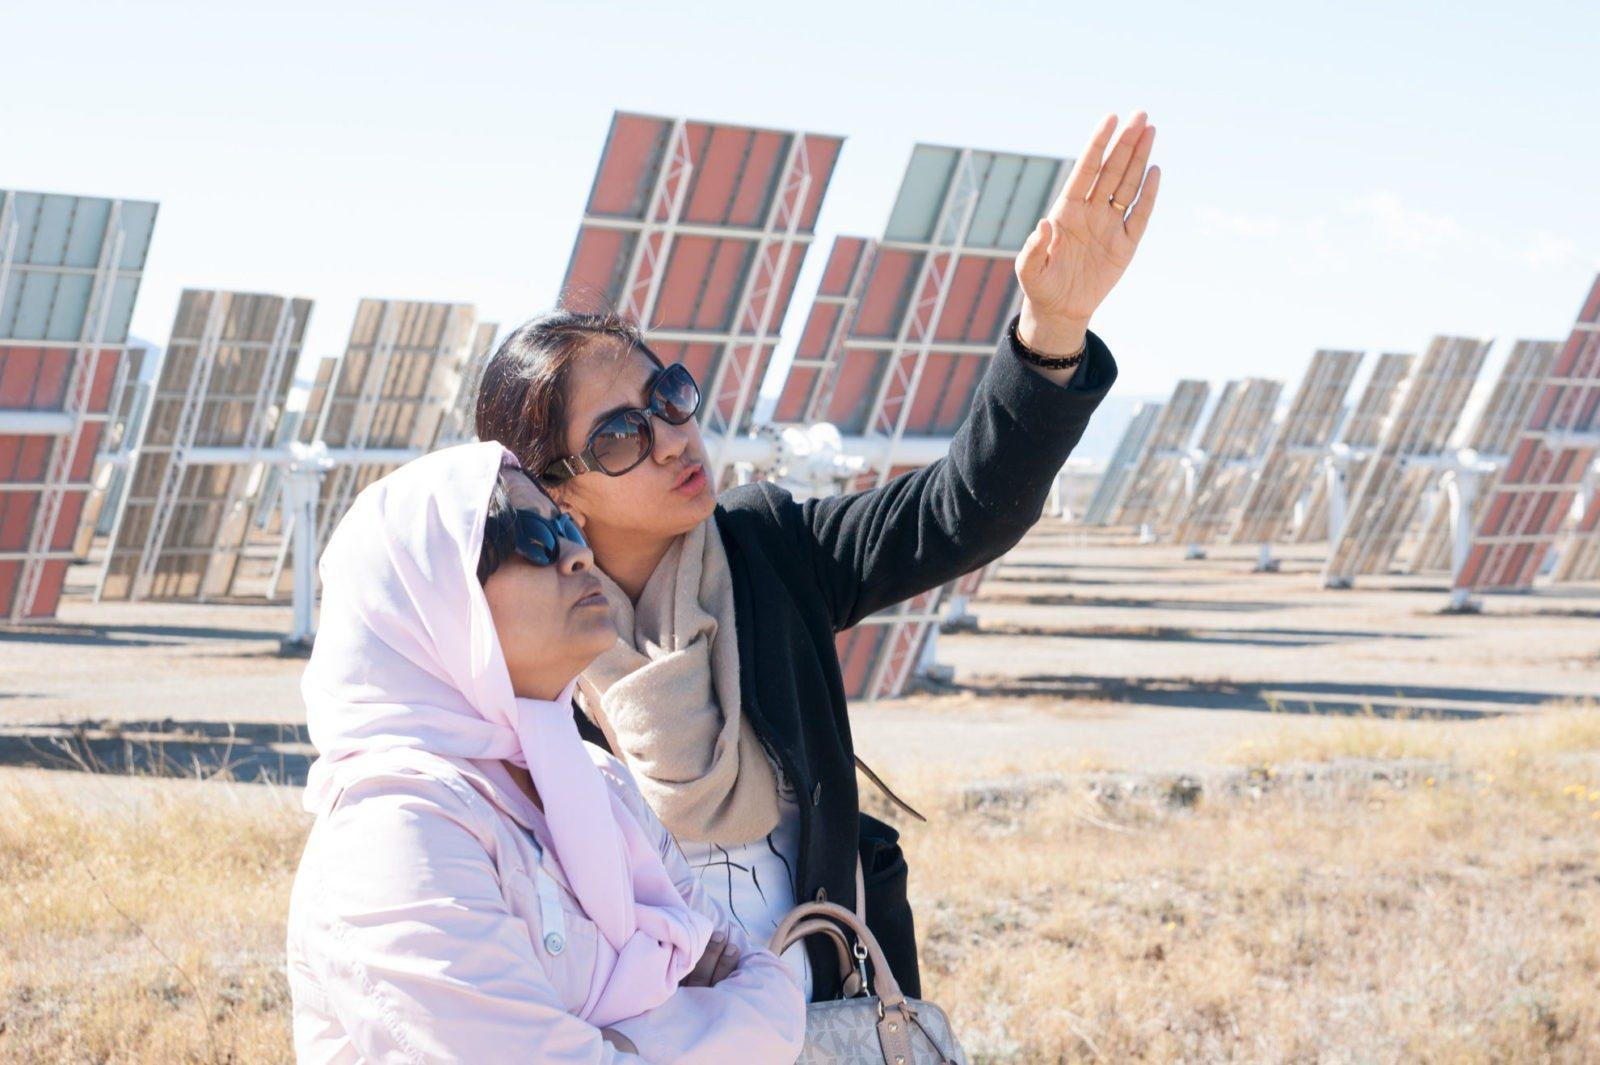 Cooperation-India-Energy-Environment_UE_Delegation-to-India_IDOM